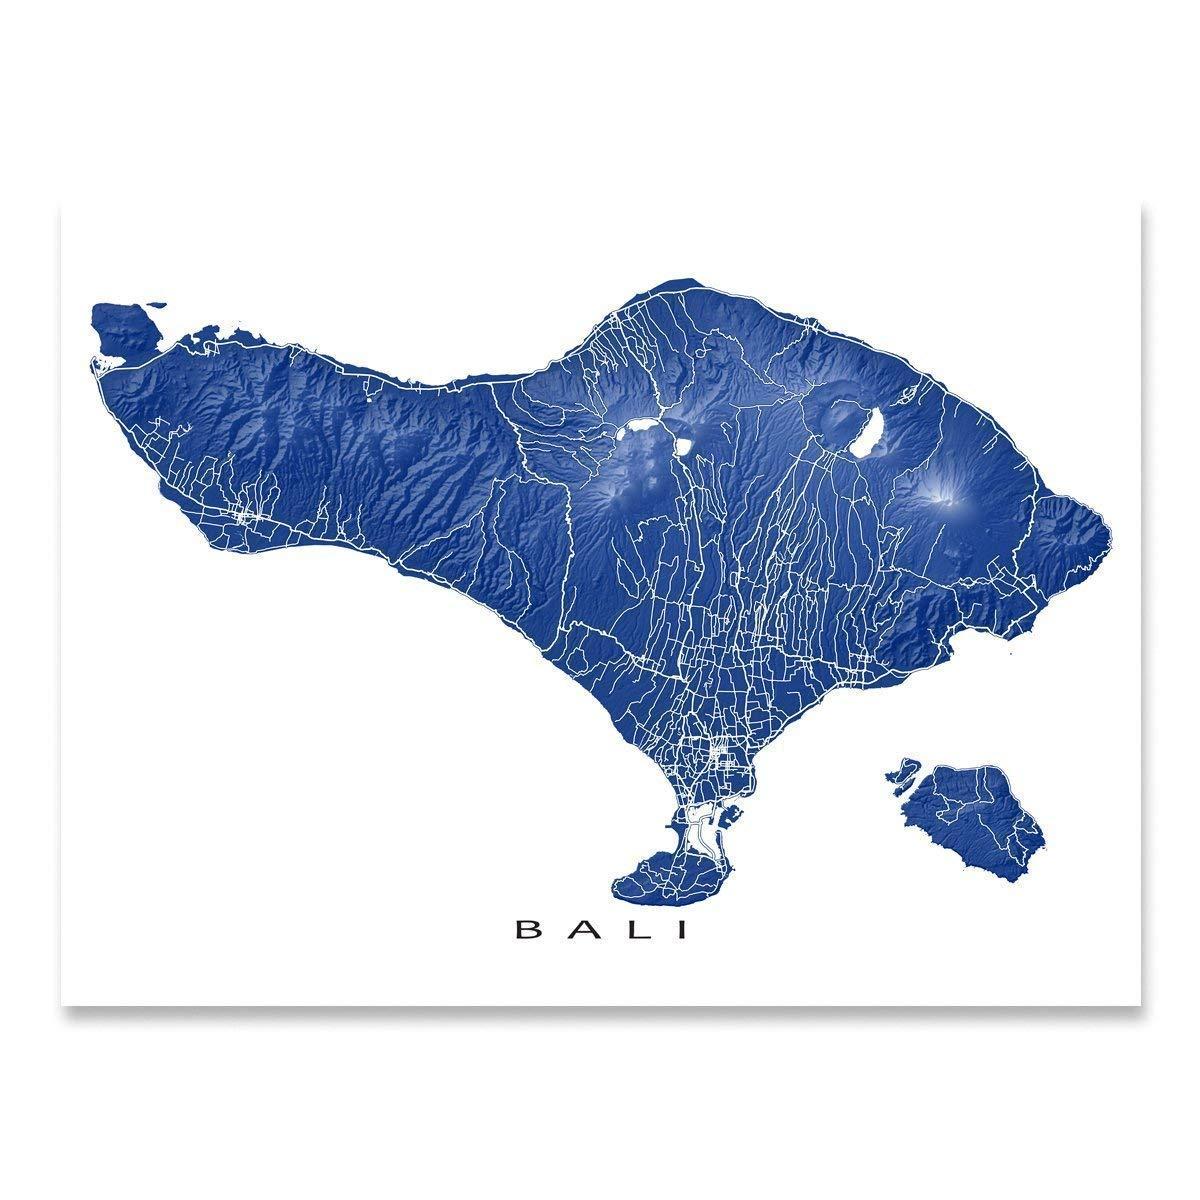 Amazon.com: Bali Map Print, Indonesia Island Landscape Art ...